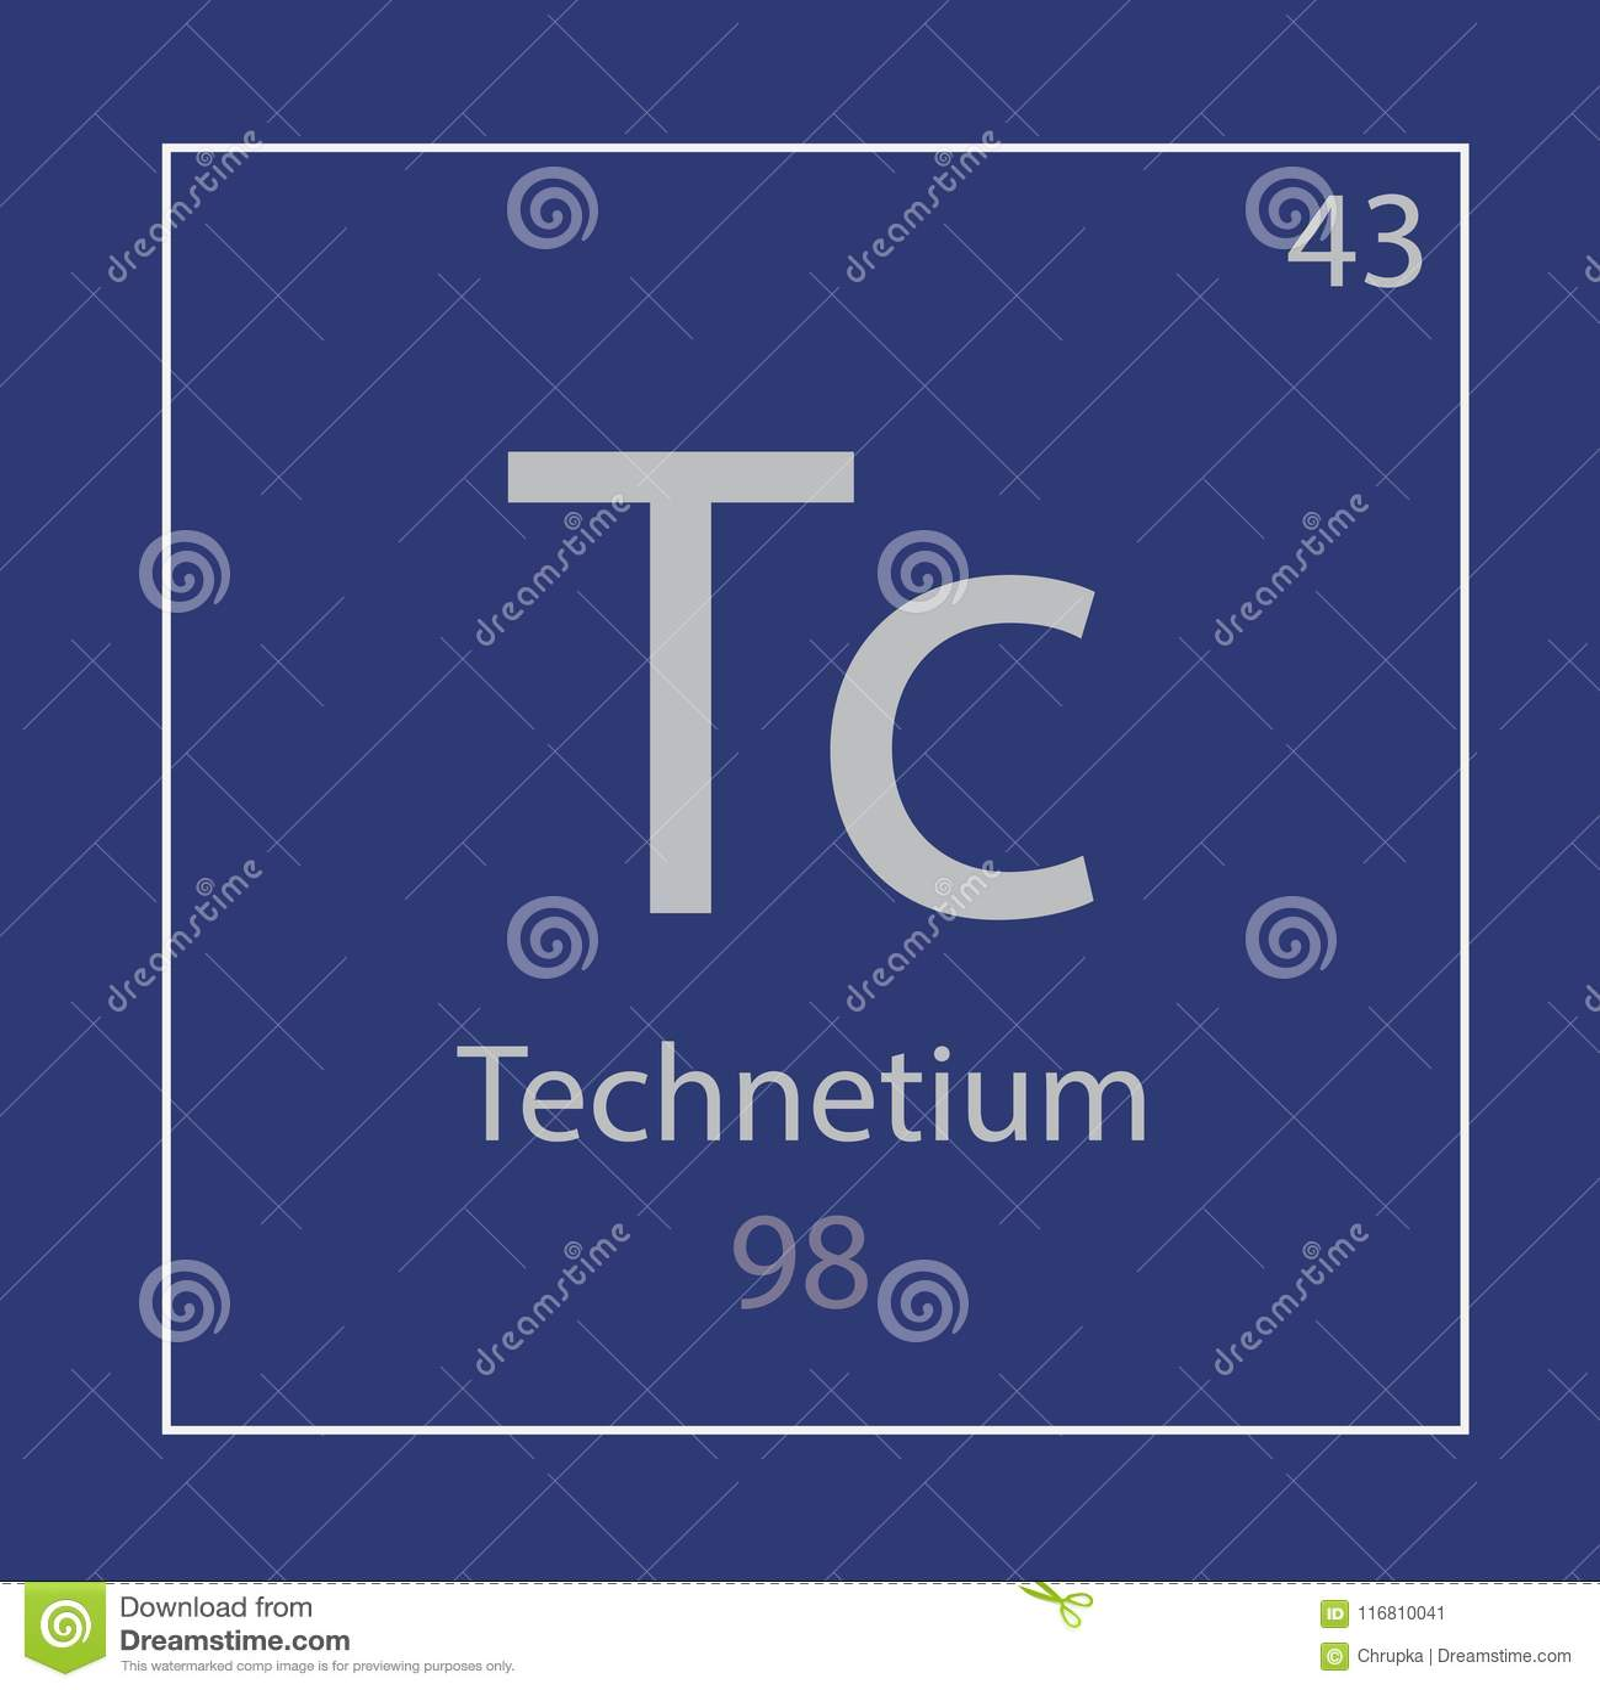 Technetium Tc Chemical Element Icon Stock Vector Illustration Of